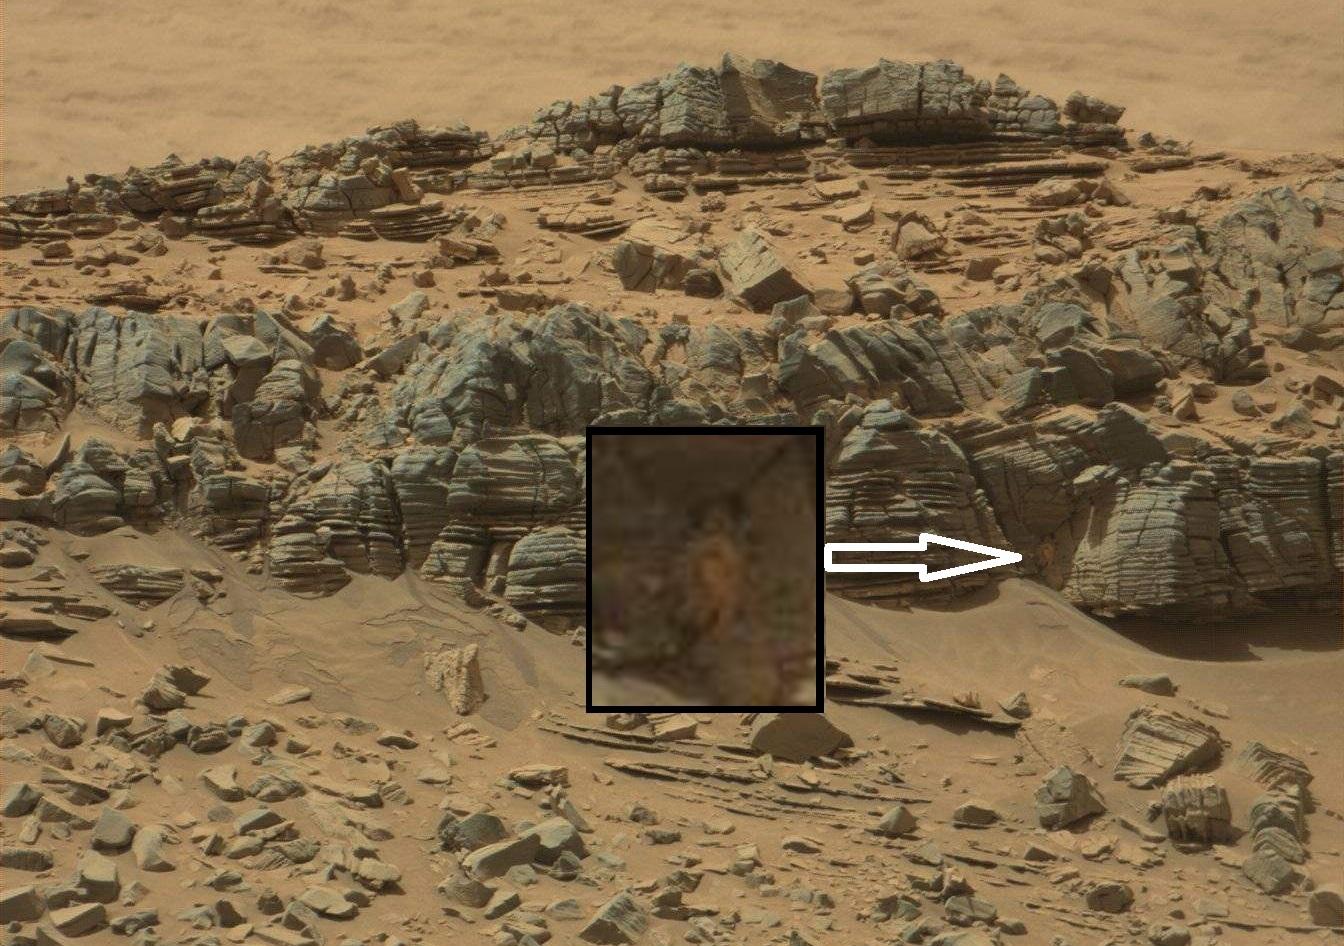 Mars crab monster